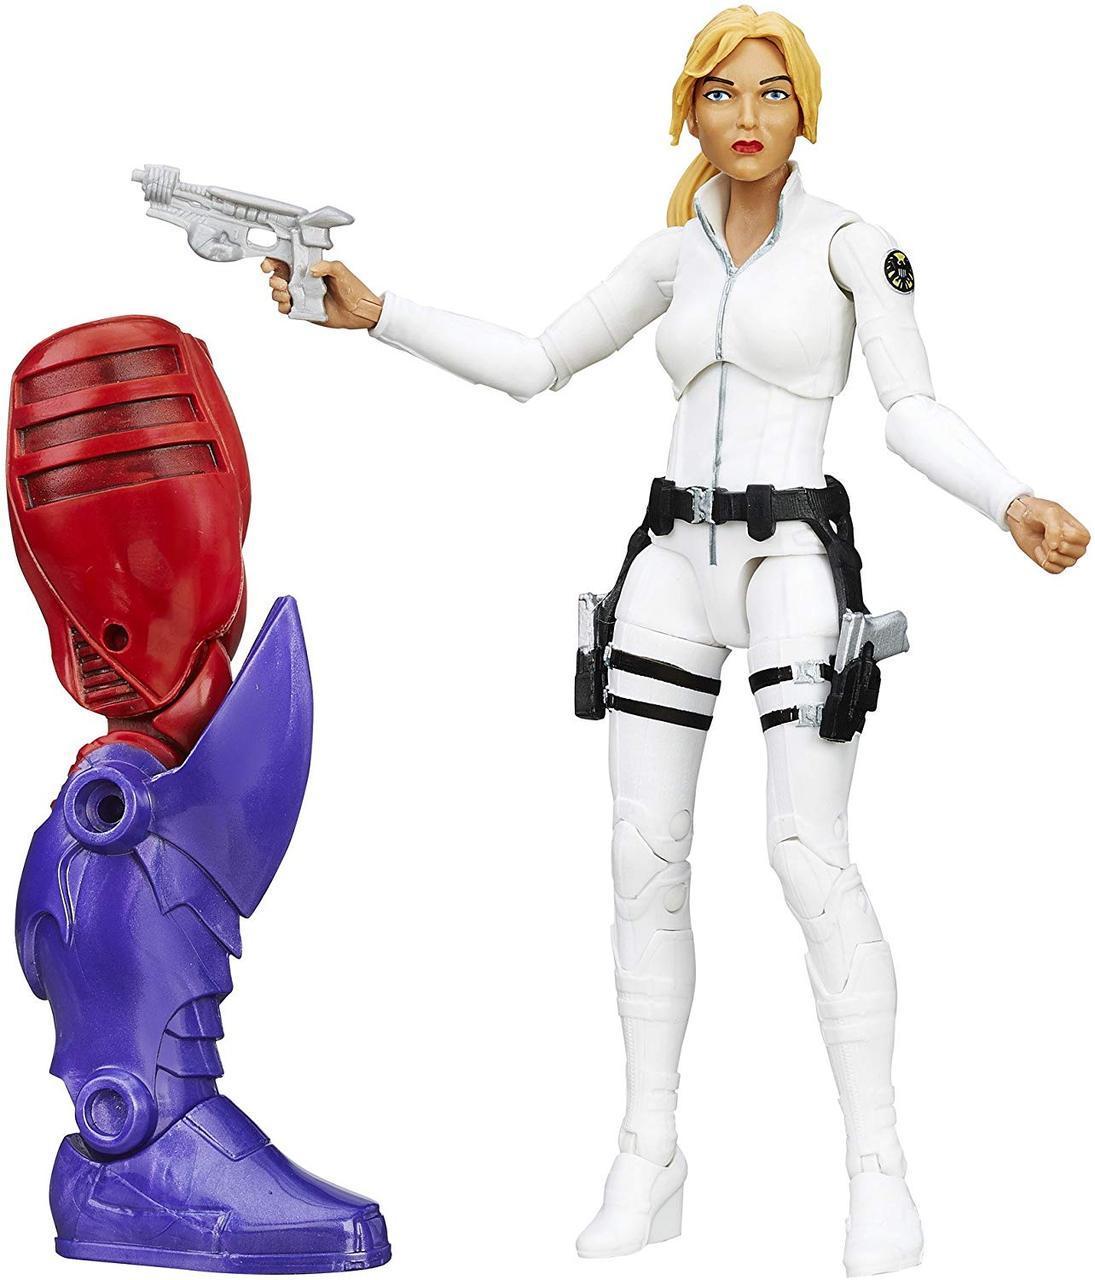 Фигурка Hasbro Шэрон Картер, Легенды Марвел 15 см - Build a Figure, Red Skull Series, фото 1